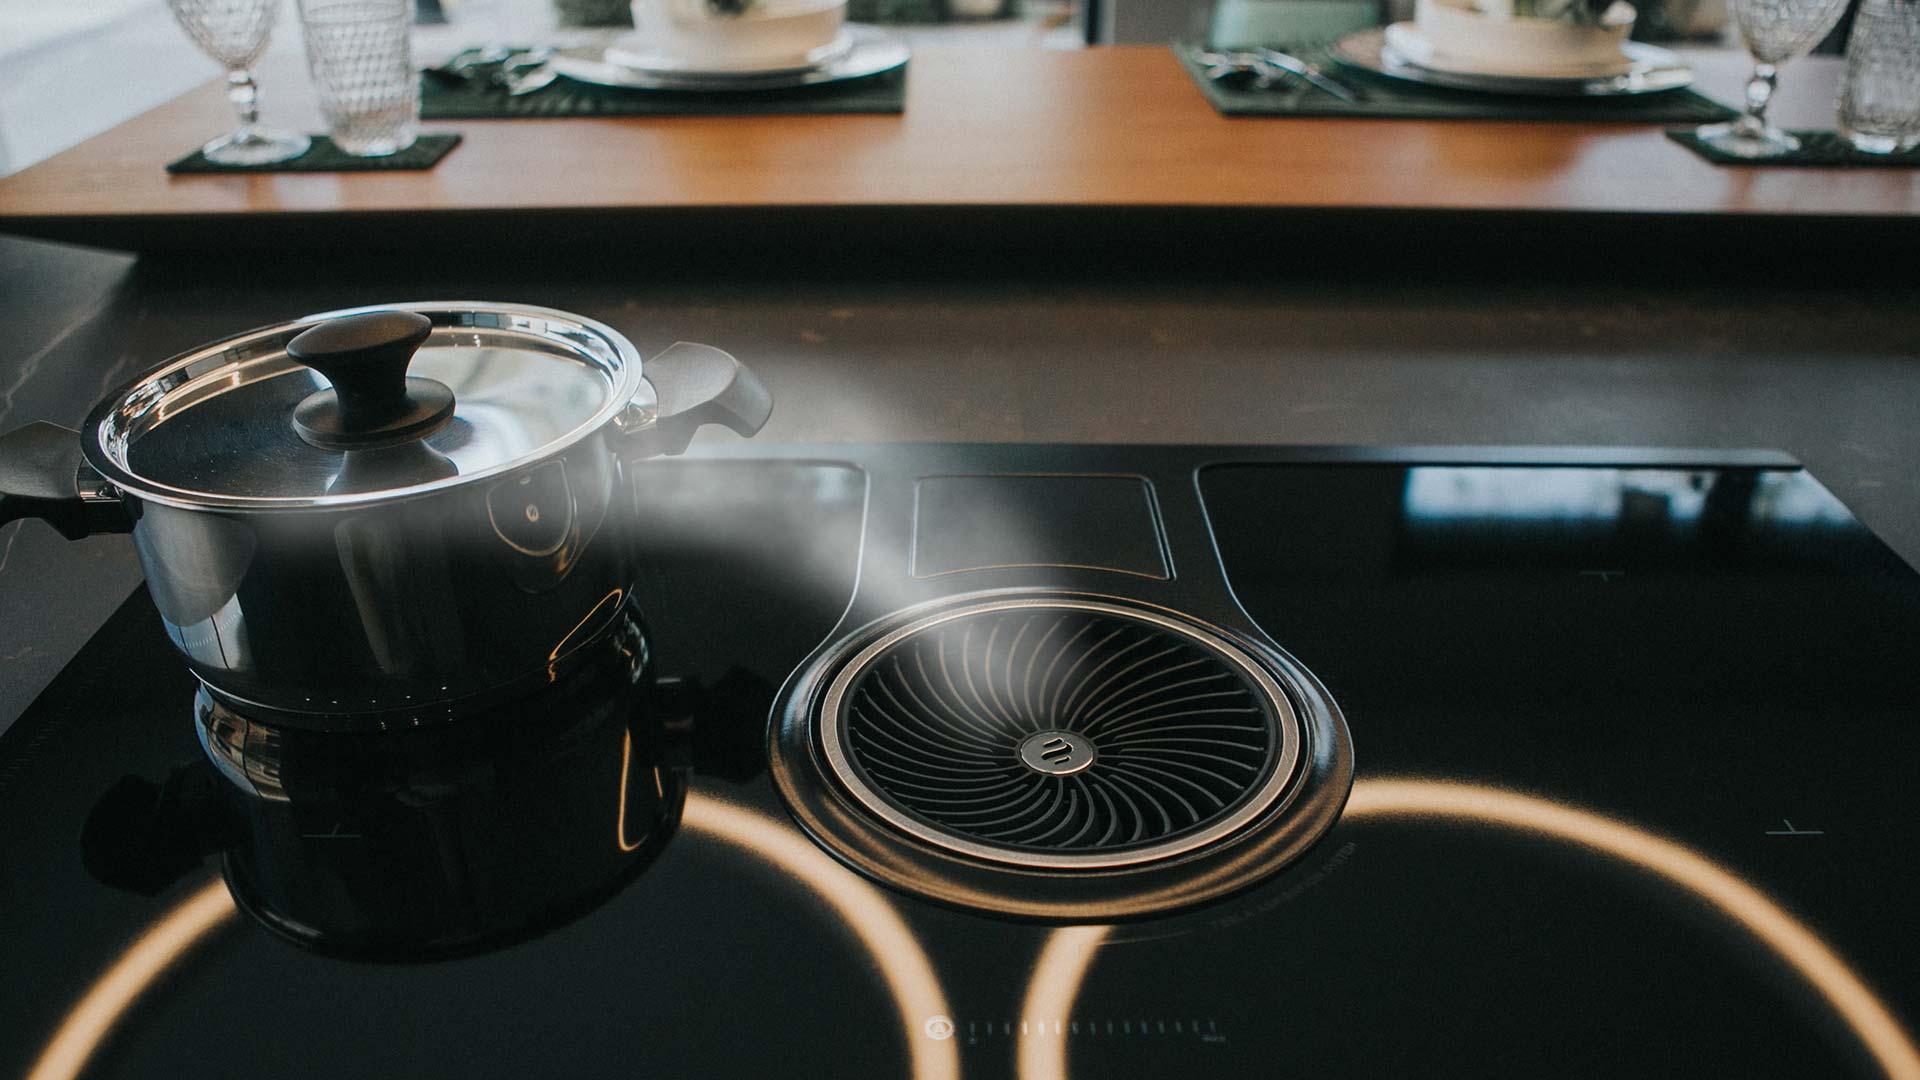 electrodomesticos-murcia-cartagena-la-manga-appliances